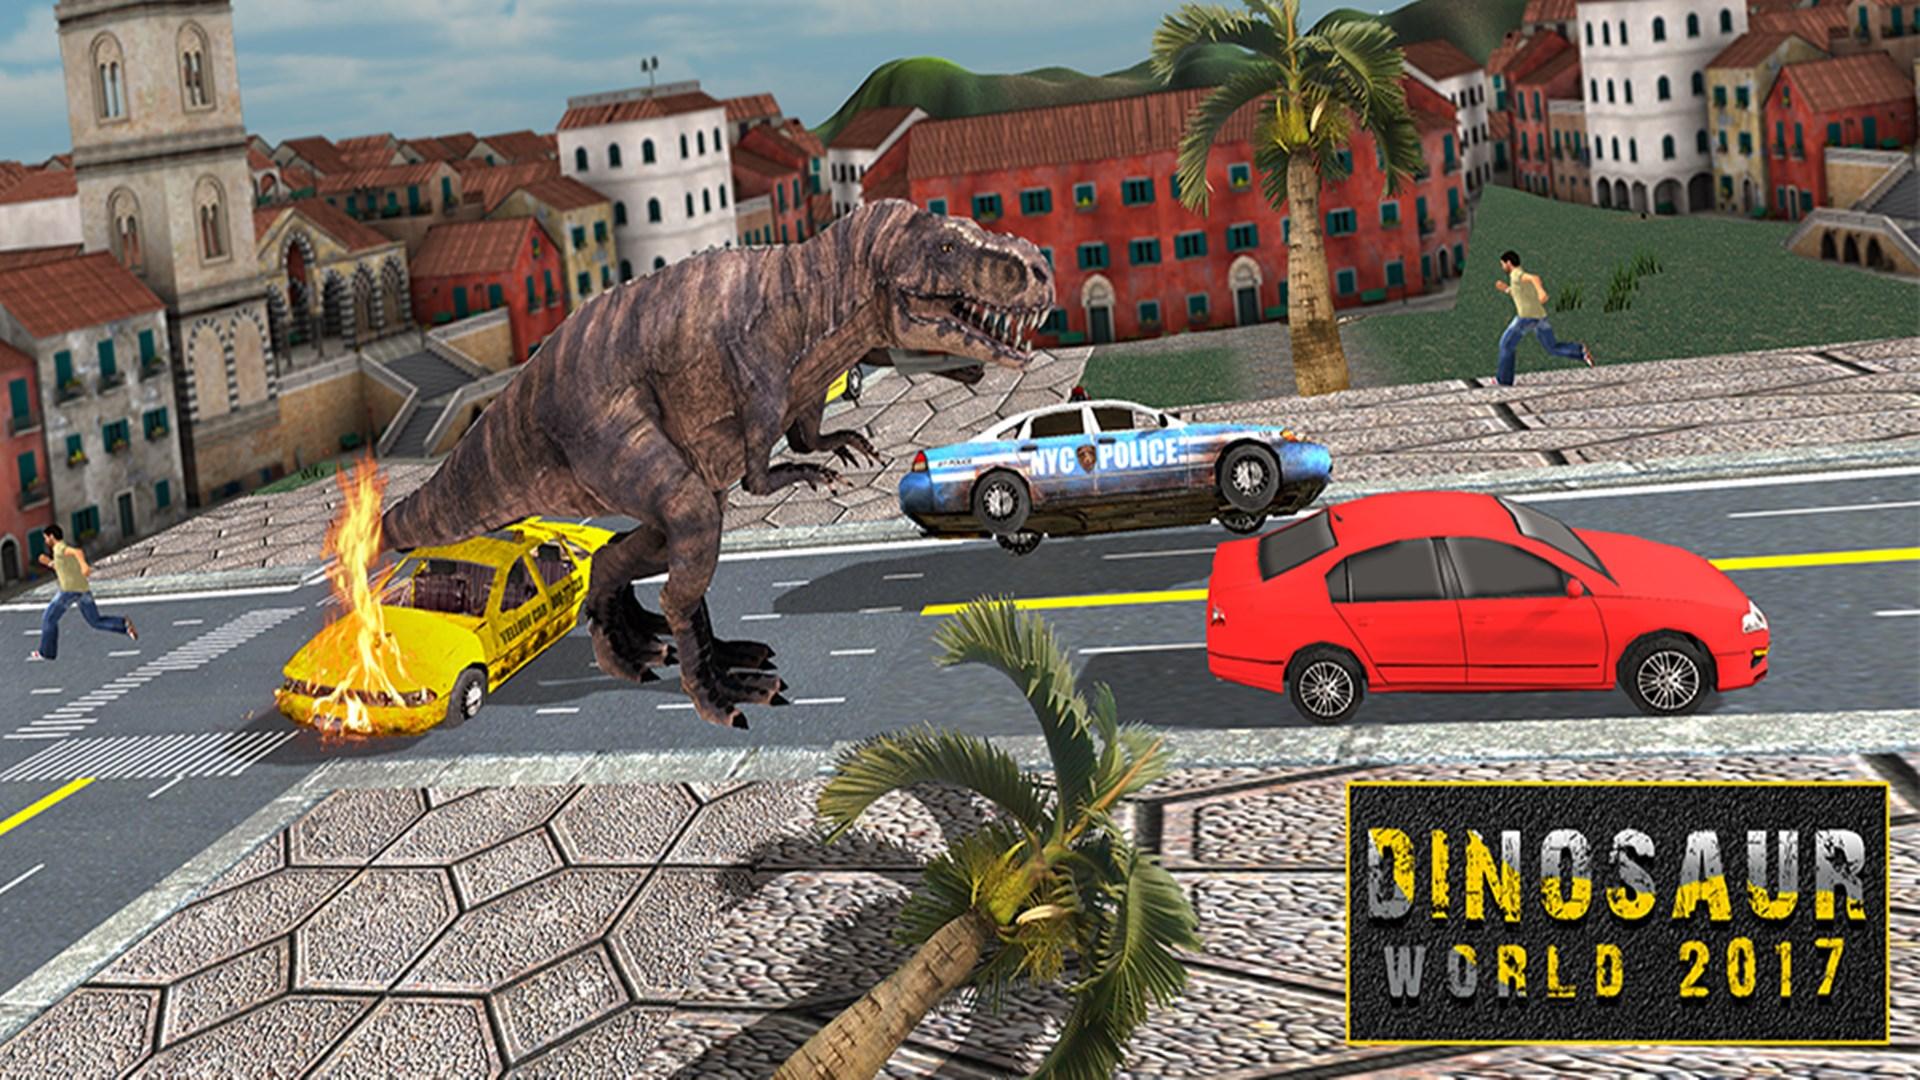 Get Dinosaur World 2017 - Microsoft Store